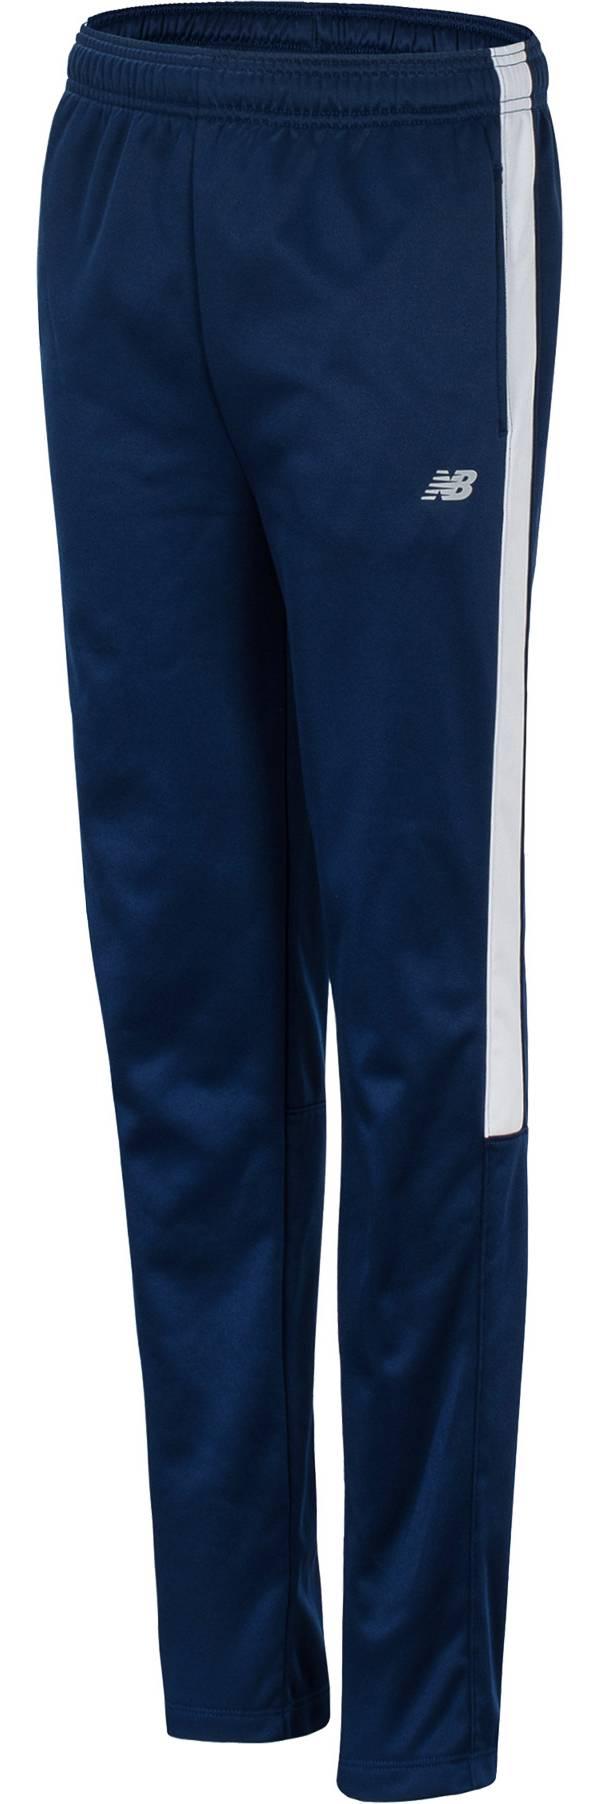 New Balance Little Boys' Athletic Pants product image